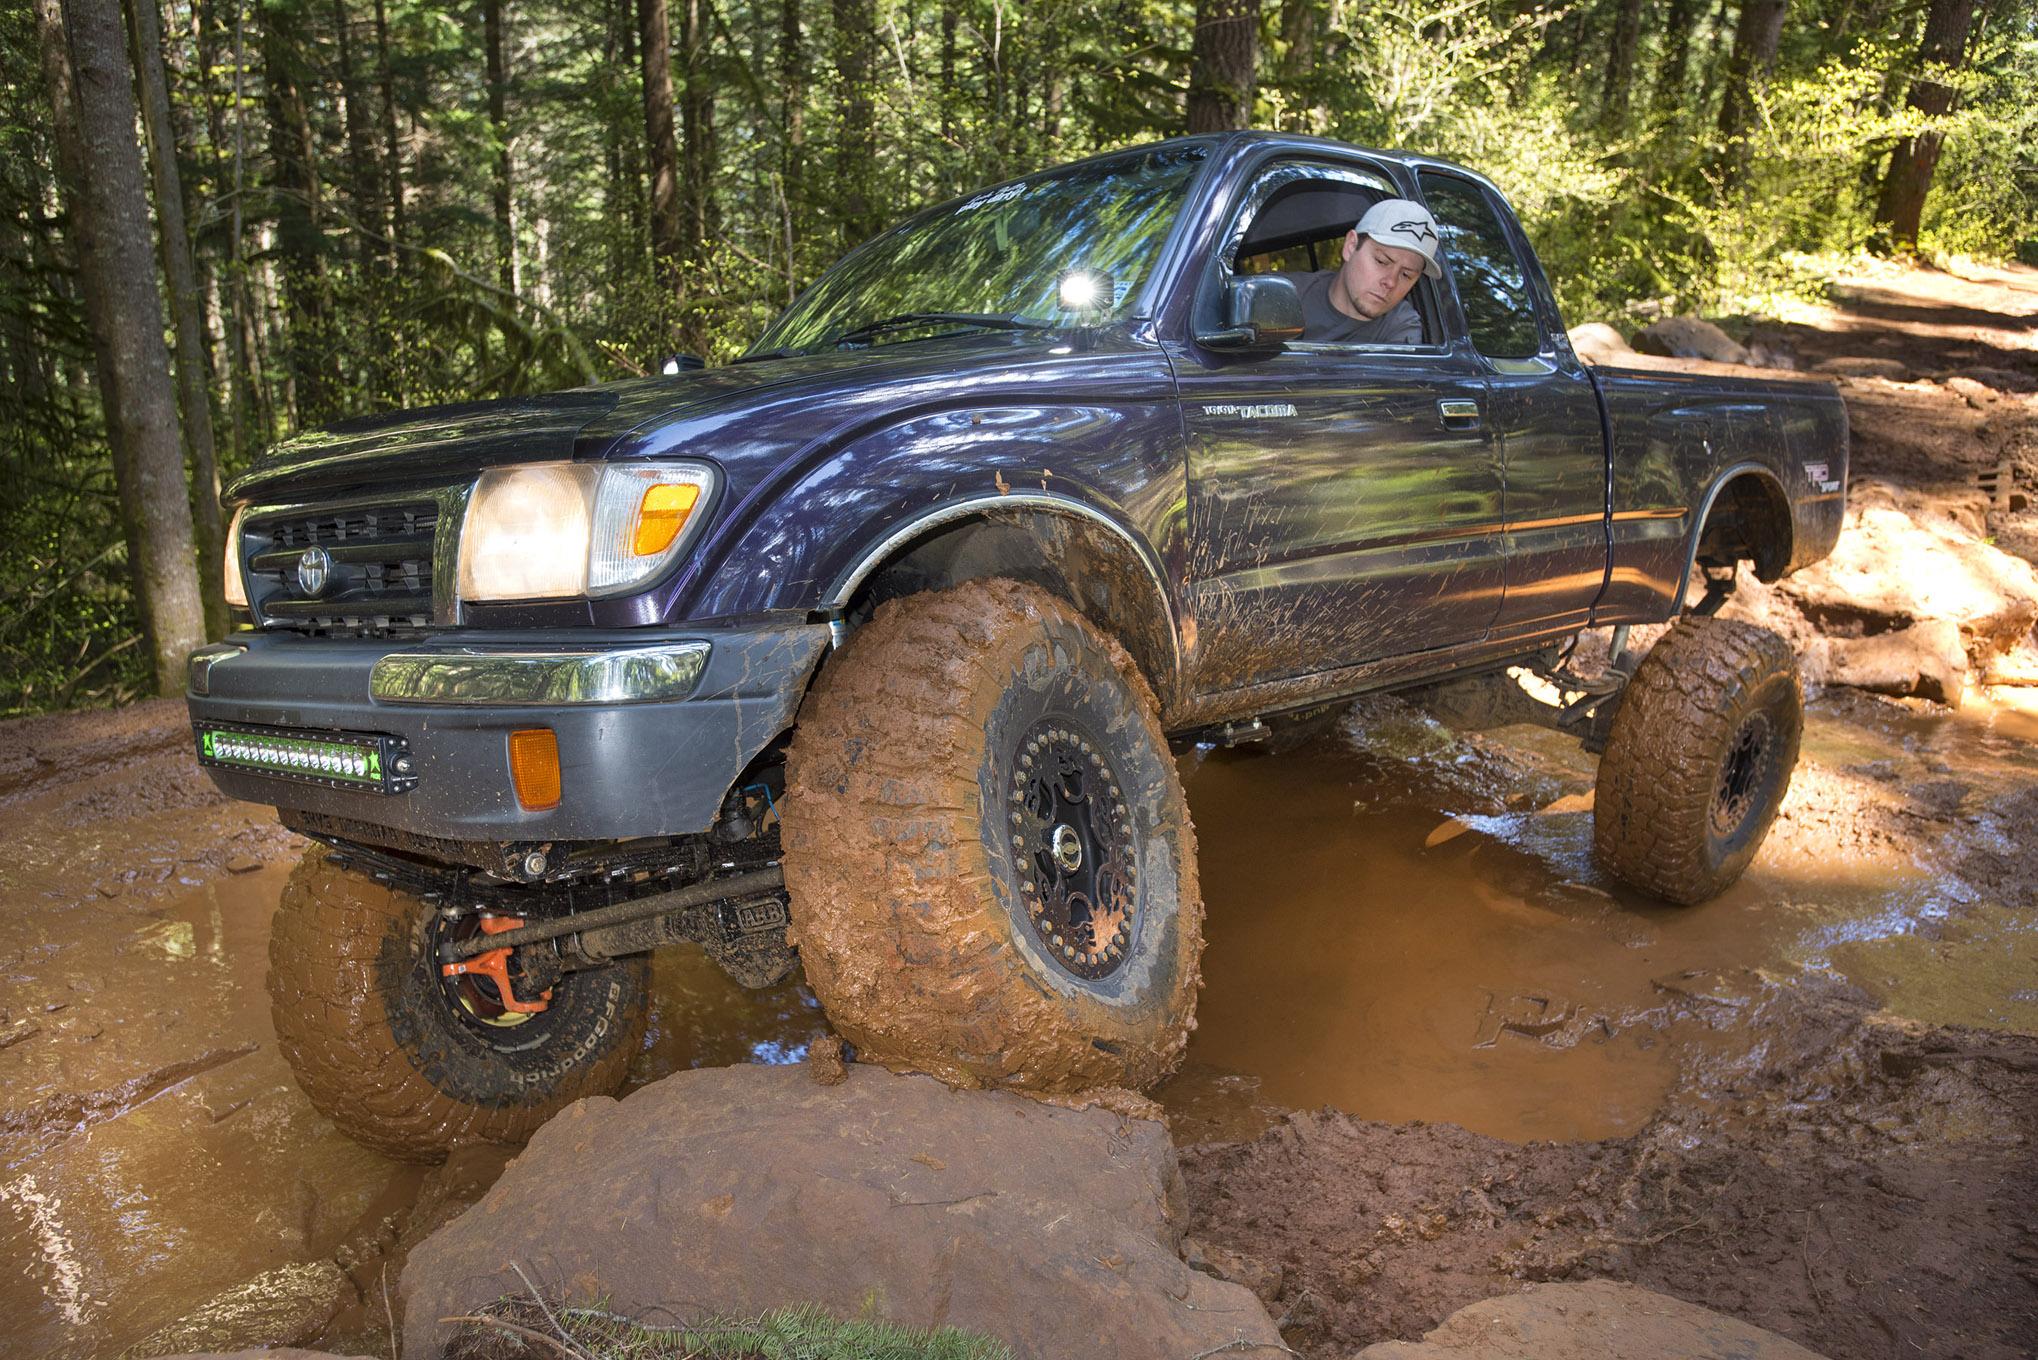 028 Toy Sas Trail Test - Photo 144217075 - Solid Axle Swap